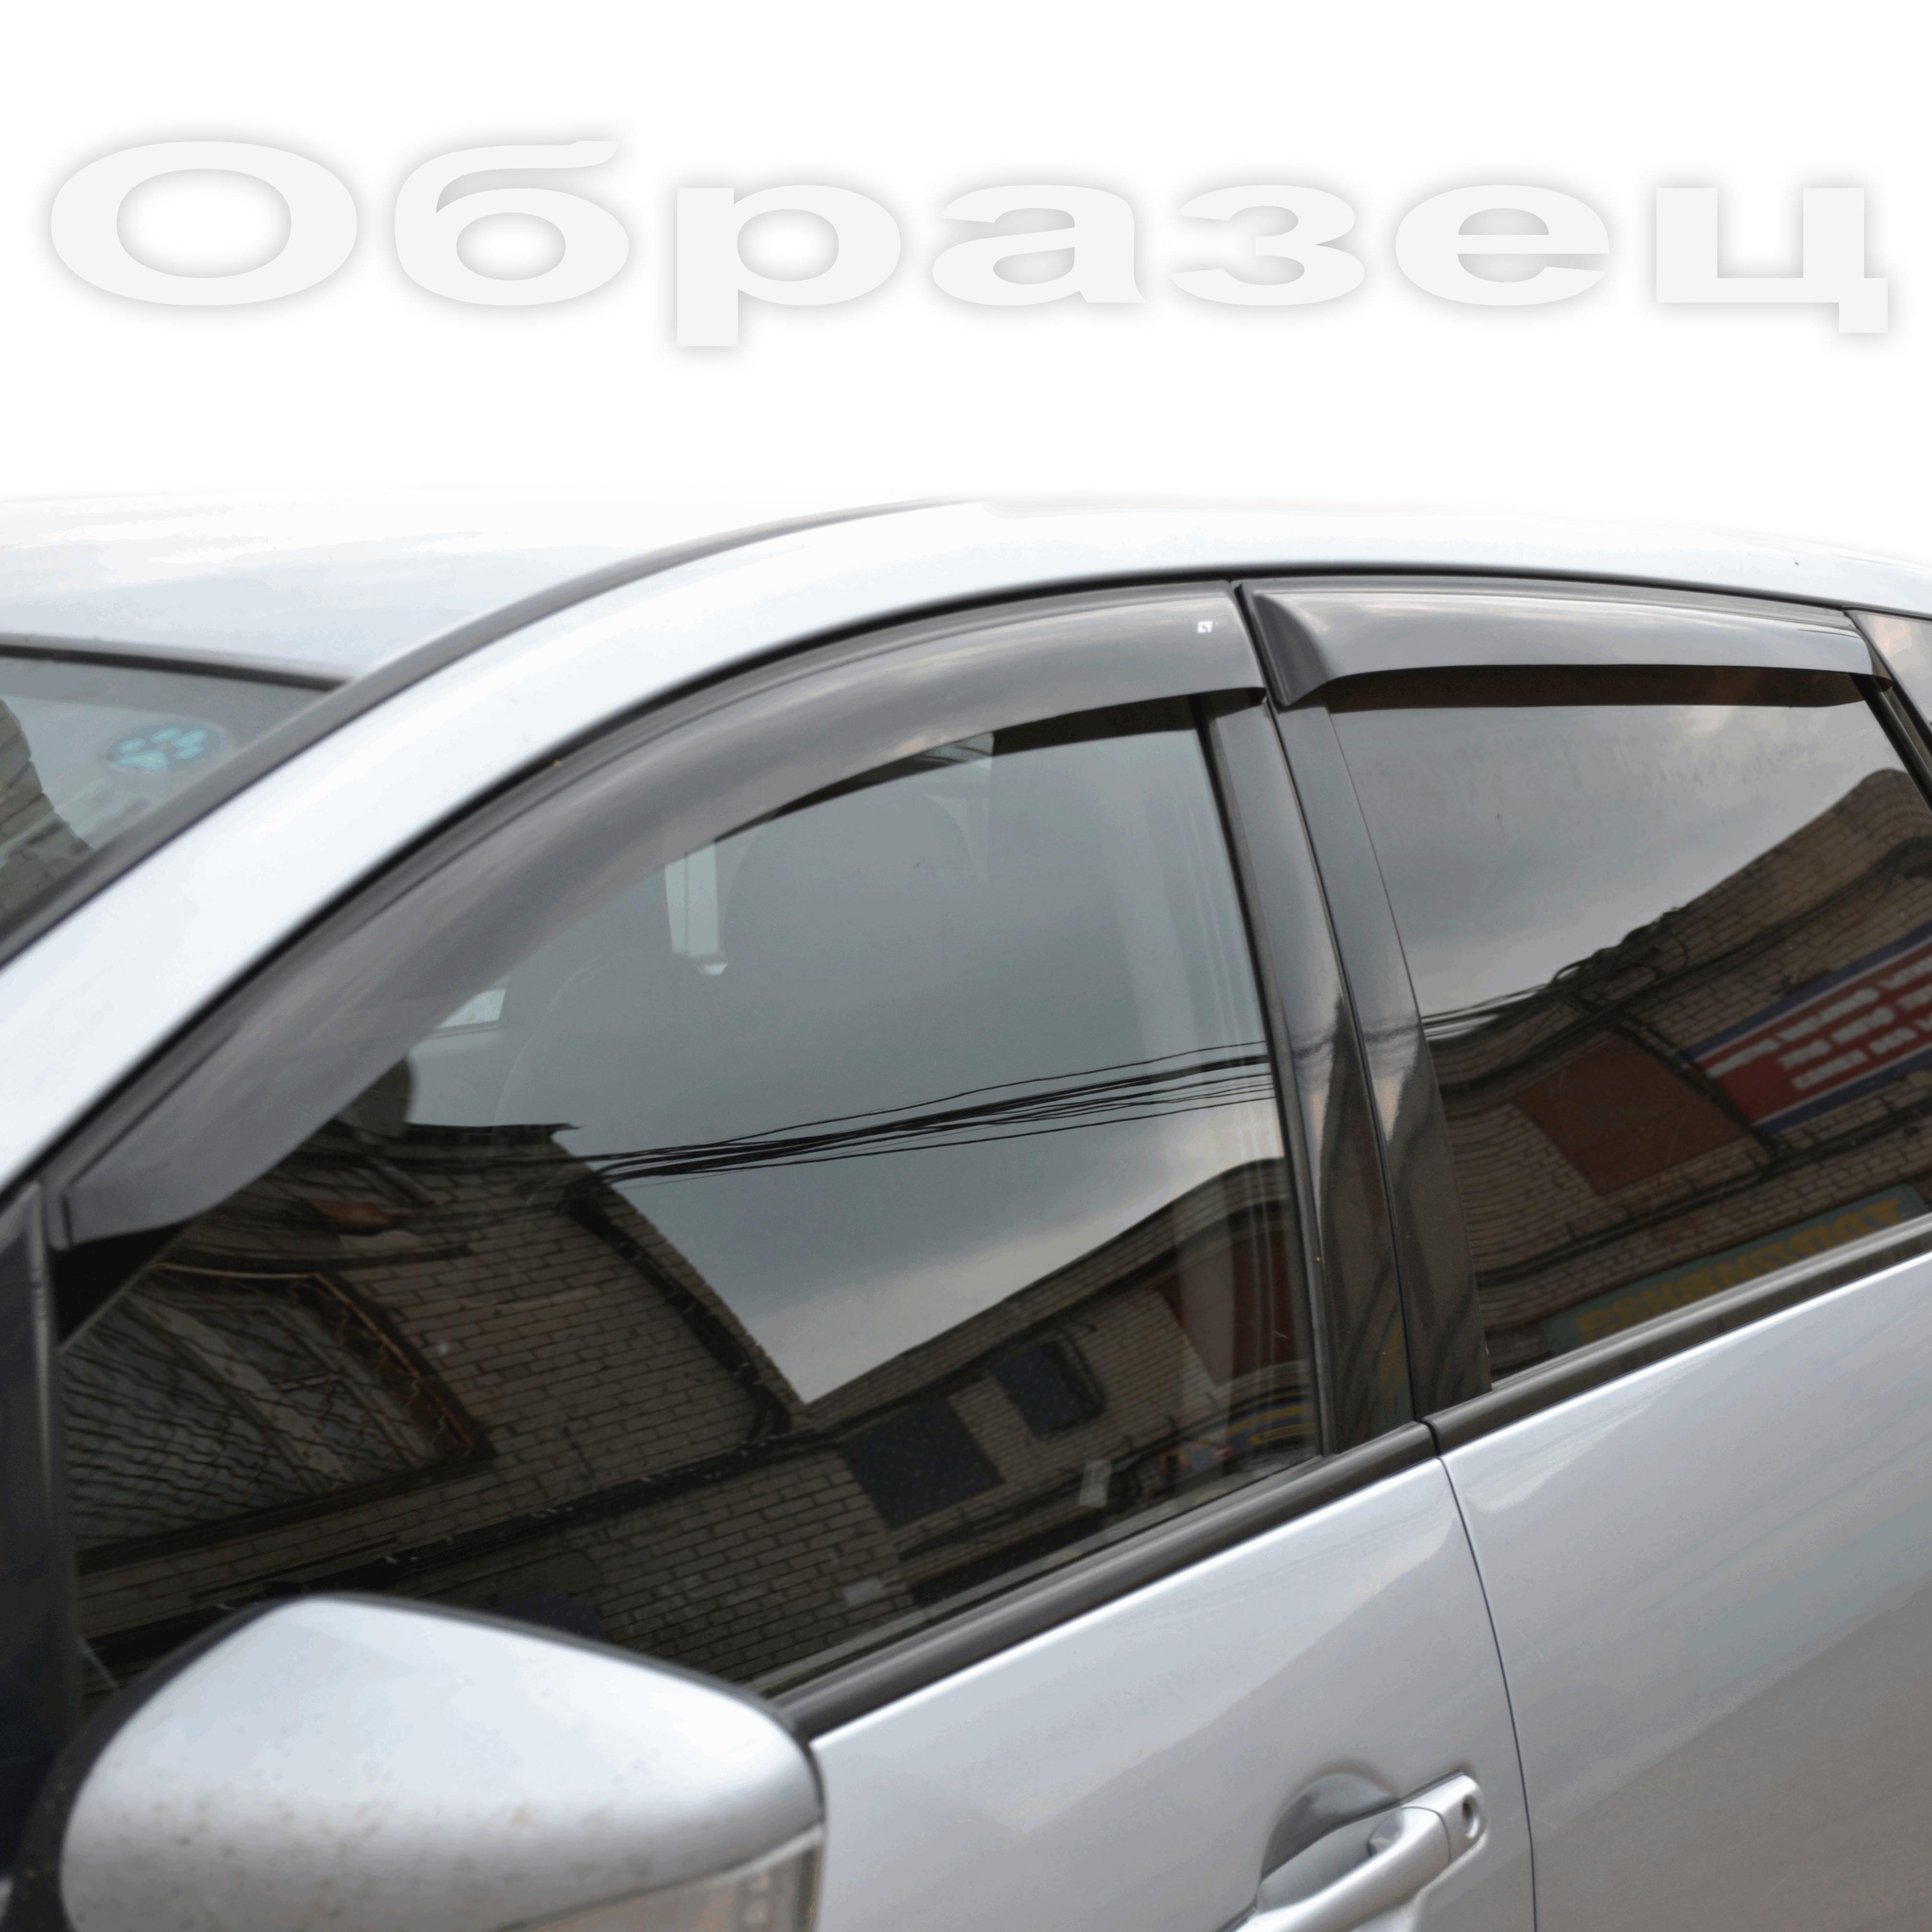 Дефлекторы окон Volkswagen Crafter 2006-, ветровики накладные